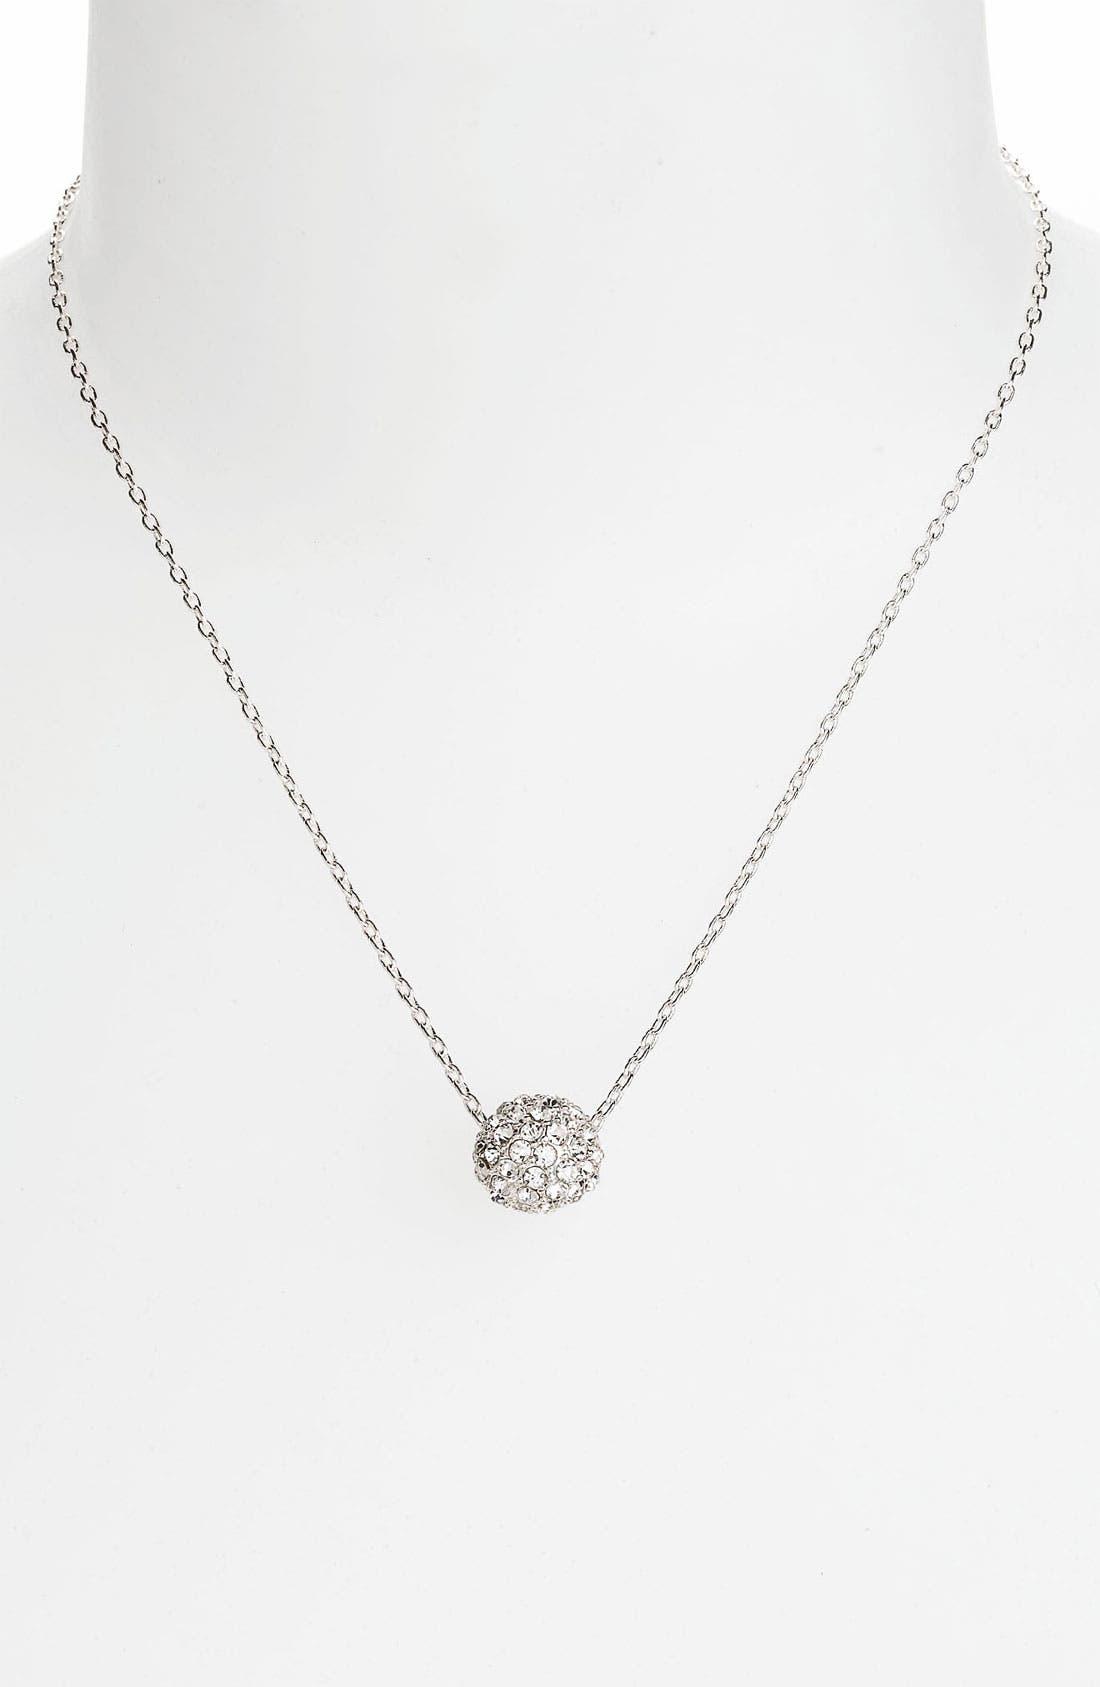 Main Image - Anne Klein Pendant Necklace